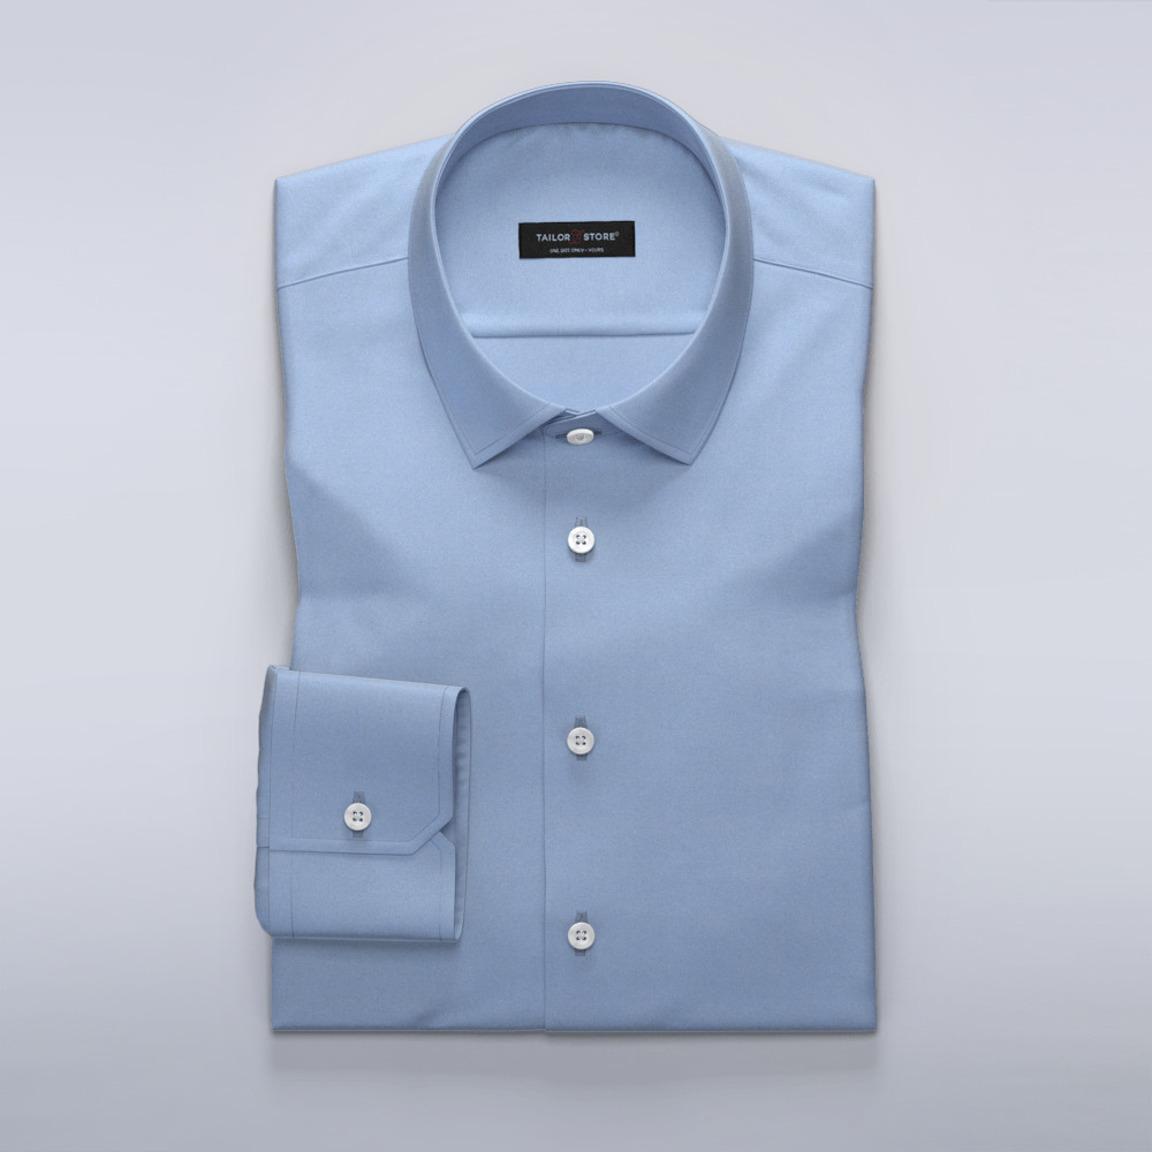 Women's business shirt in light blue herringbone